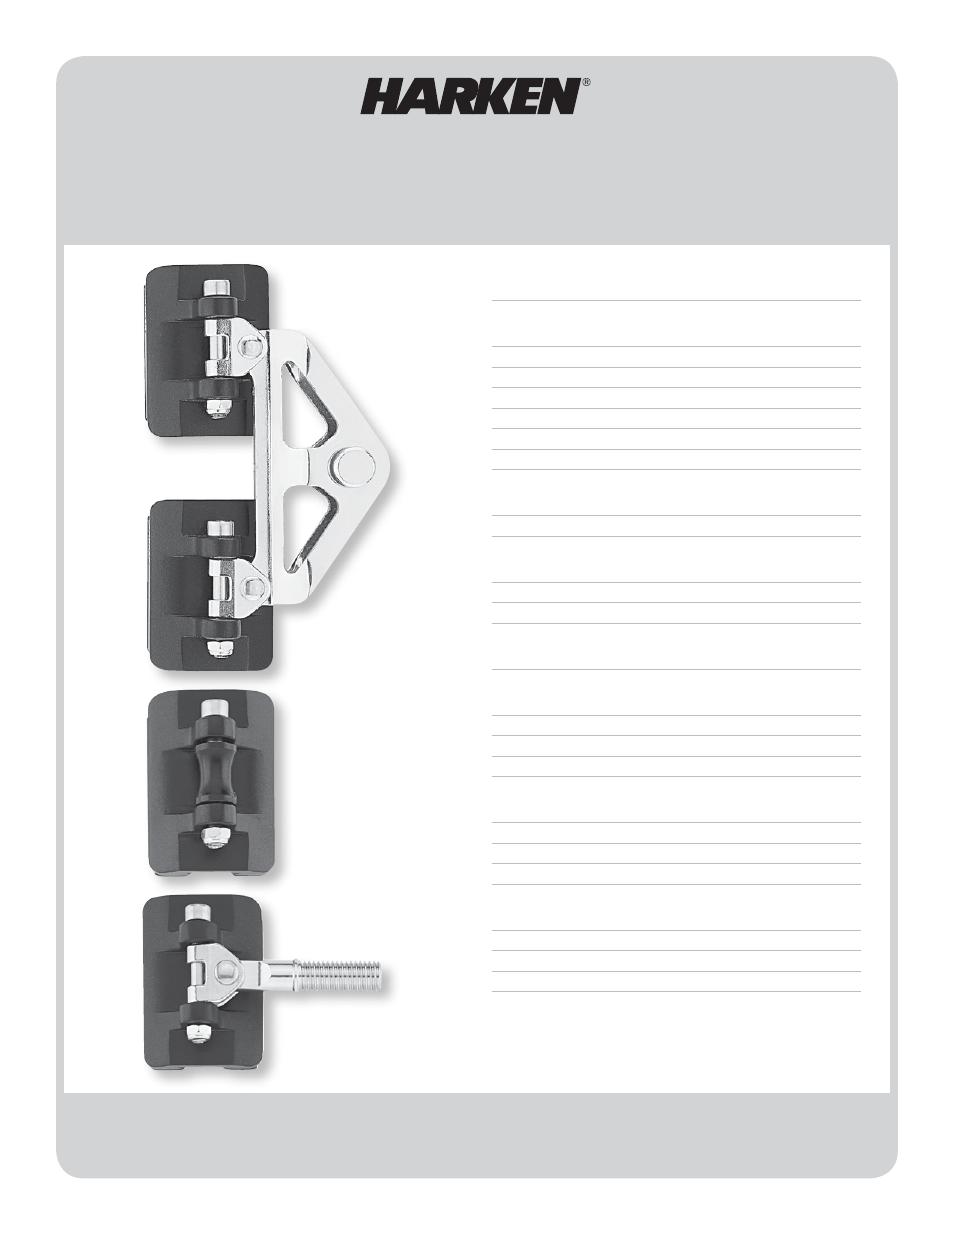 harken 3813 system aa battcar user manual 20 pages also for rh manualsdir com IBM 4247 Ribbon IBM 4247 Ribbon